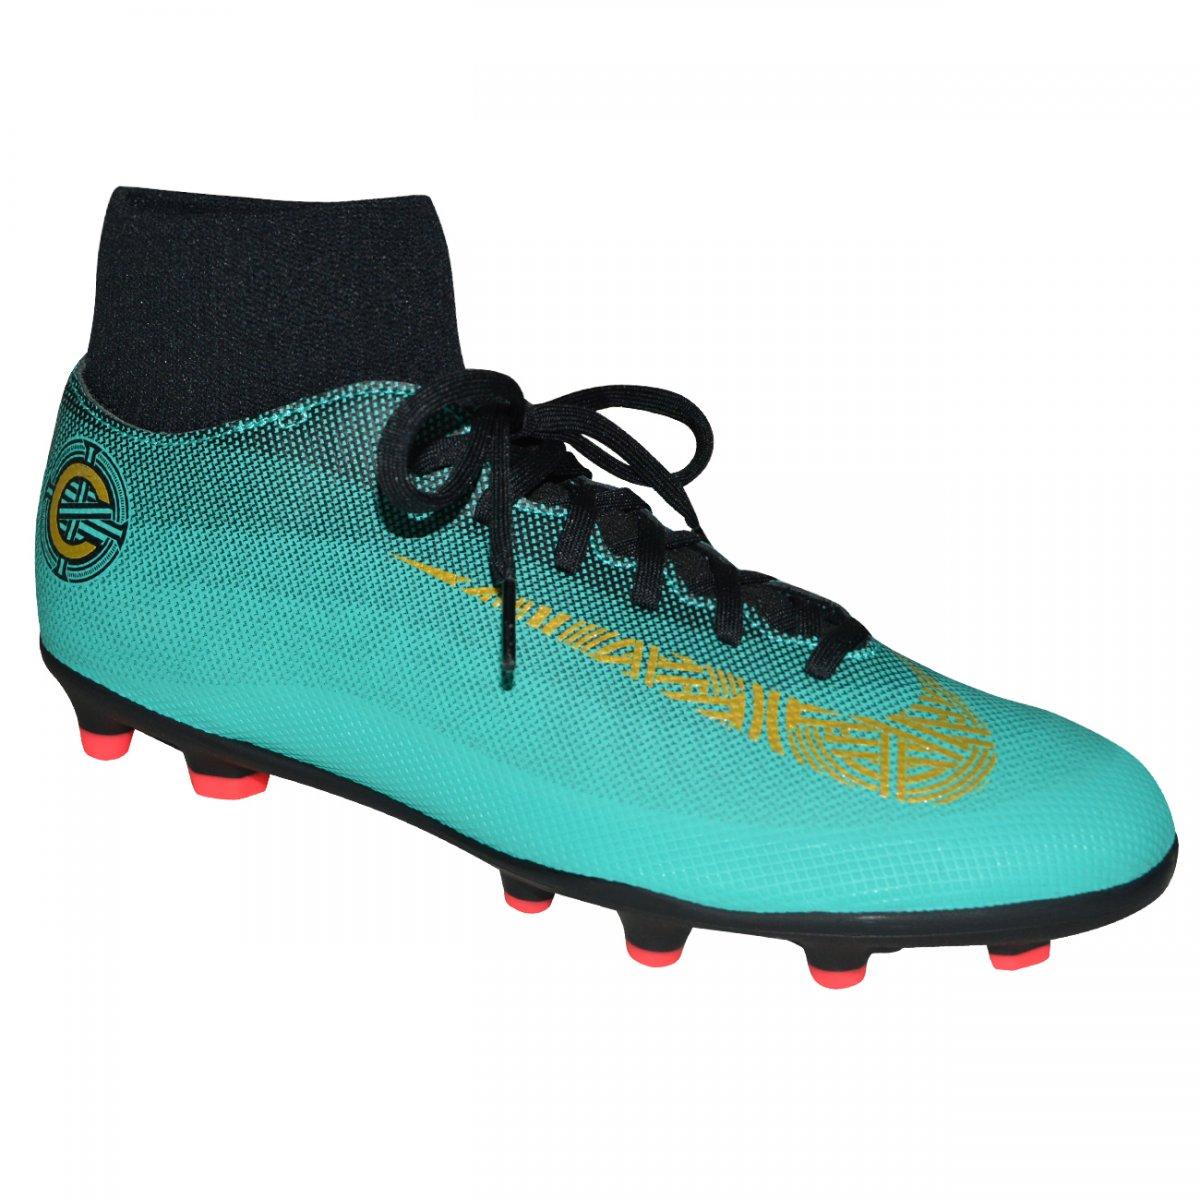 Chuteira nike superfly club aj verde dourado jpg 1200x1200 Adidas chuteiras  cr7 44a0660a5cfd9